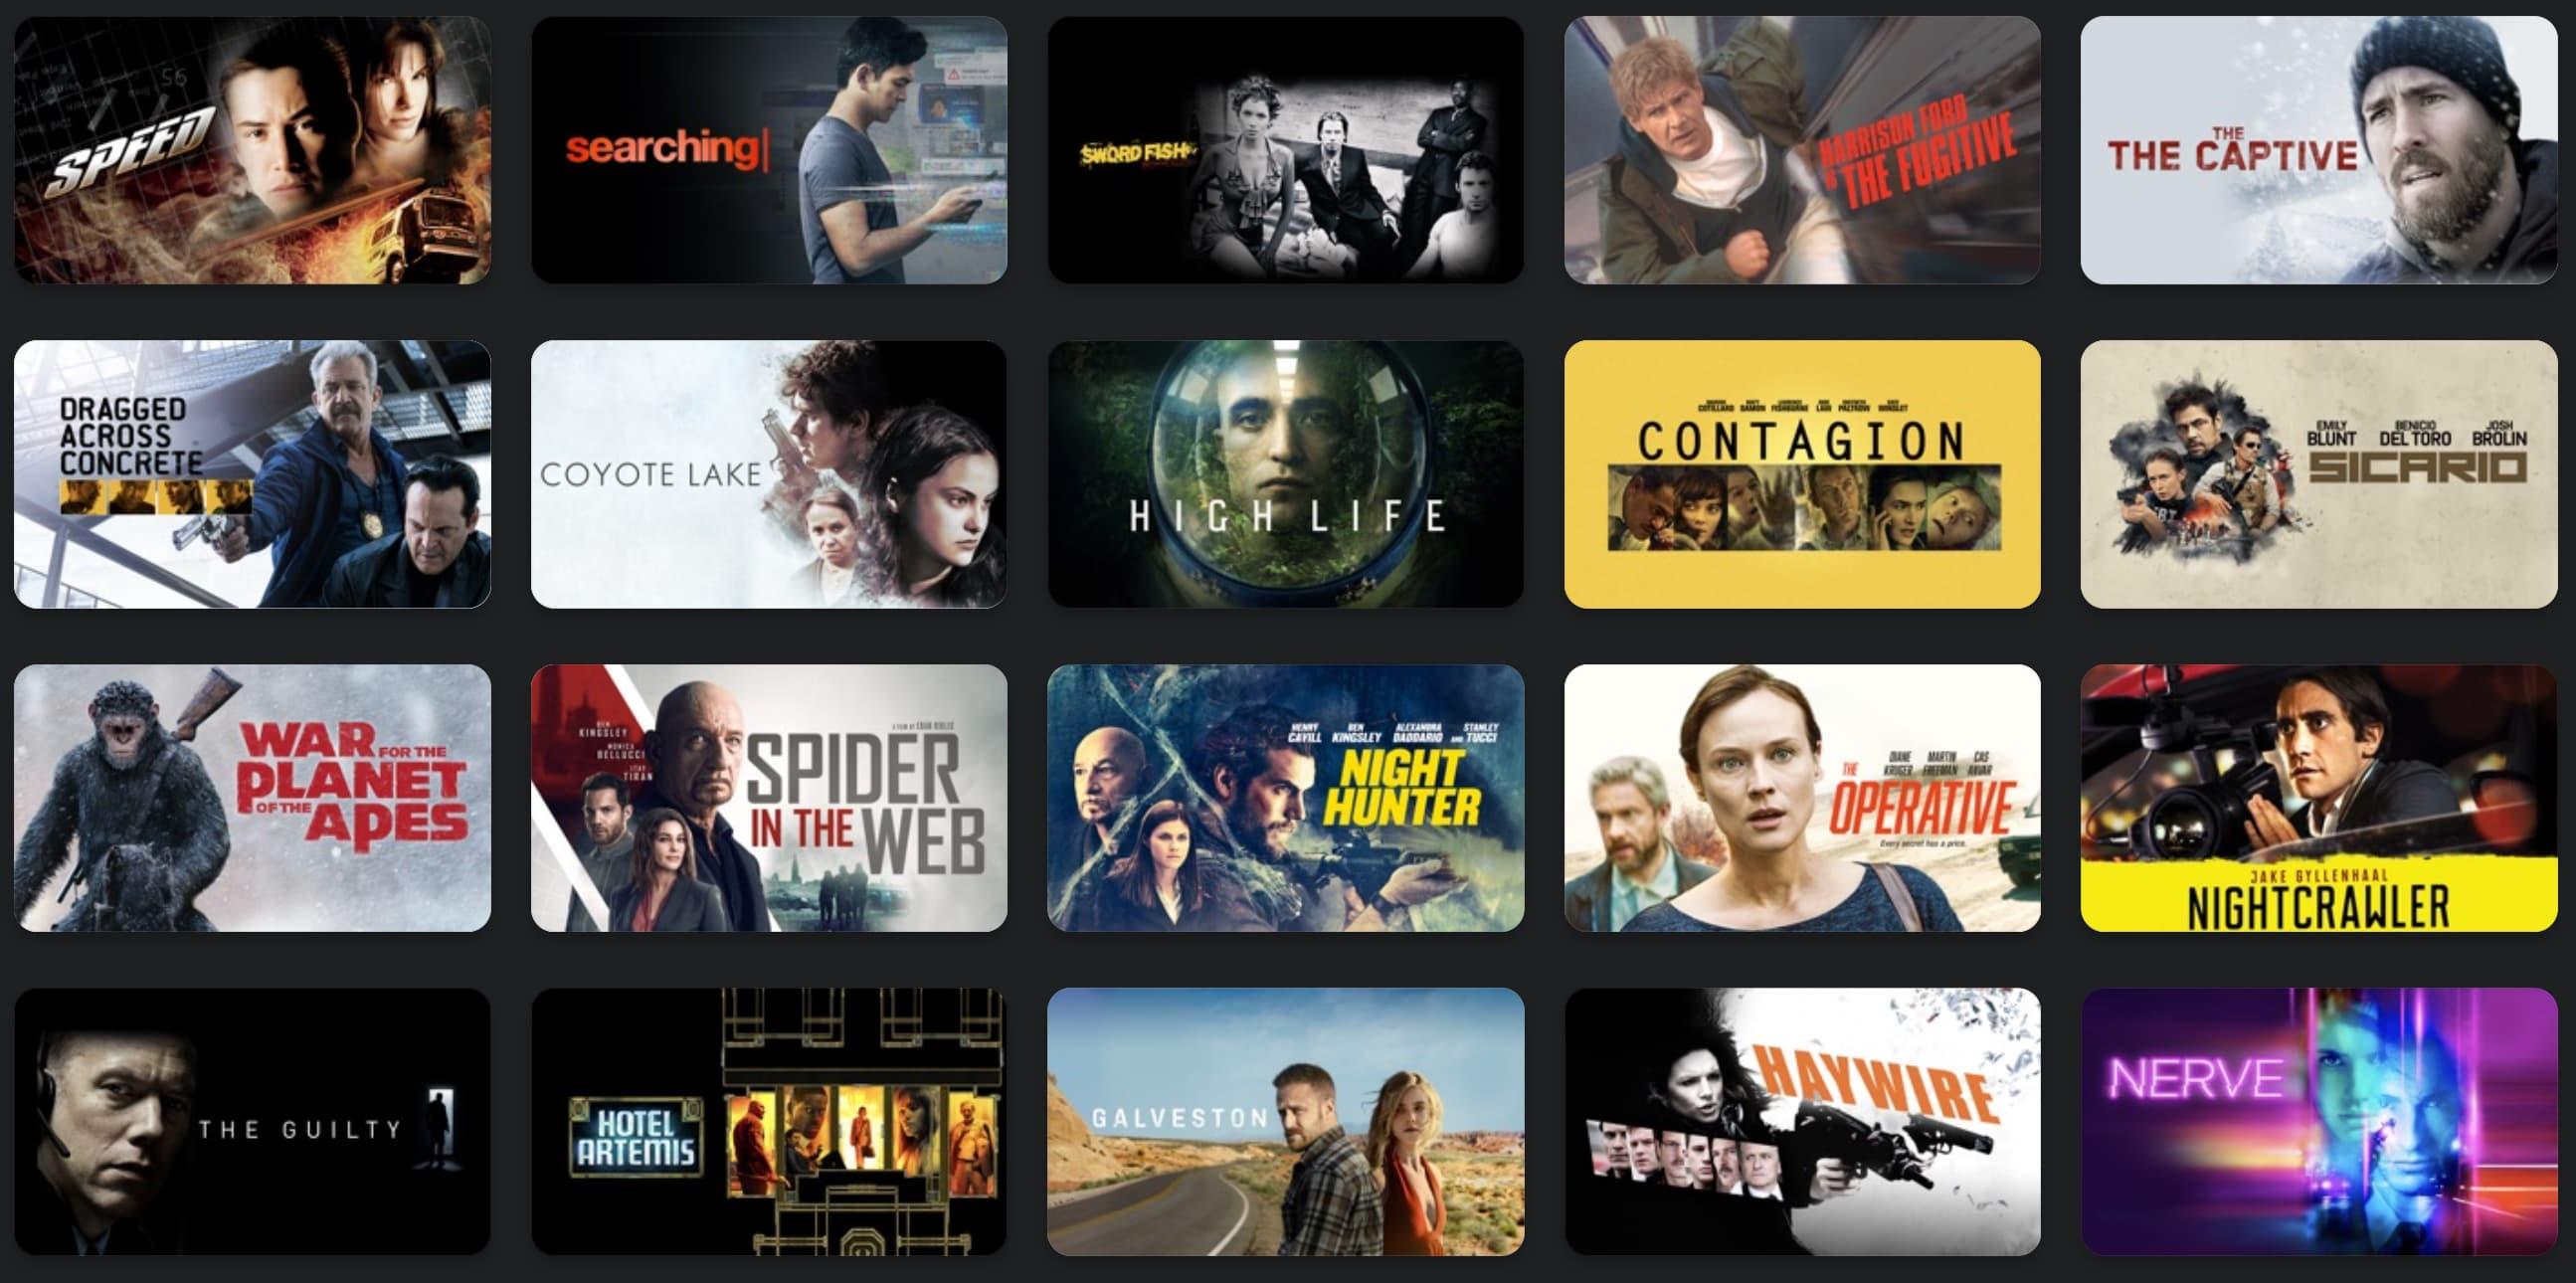 iTunes movie deals: Tarantino films under $5, gripping thrillers under $10, and much more